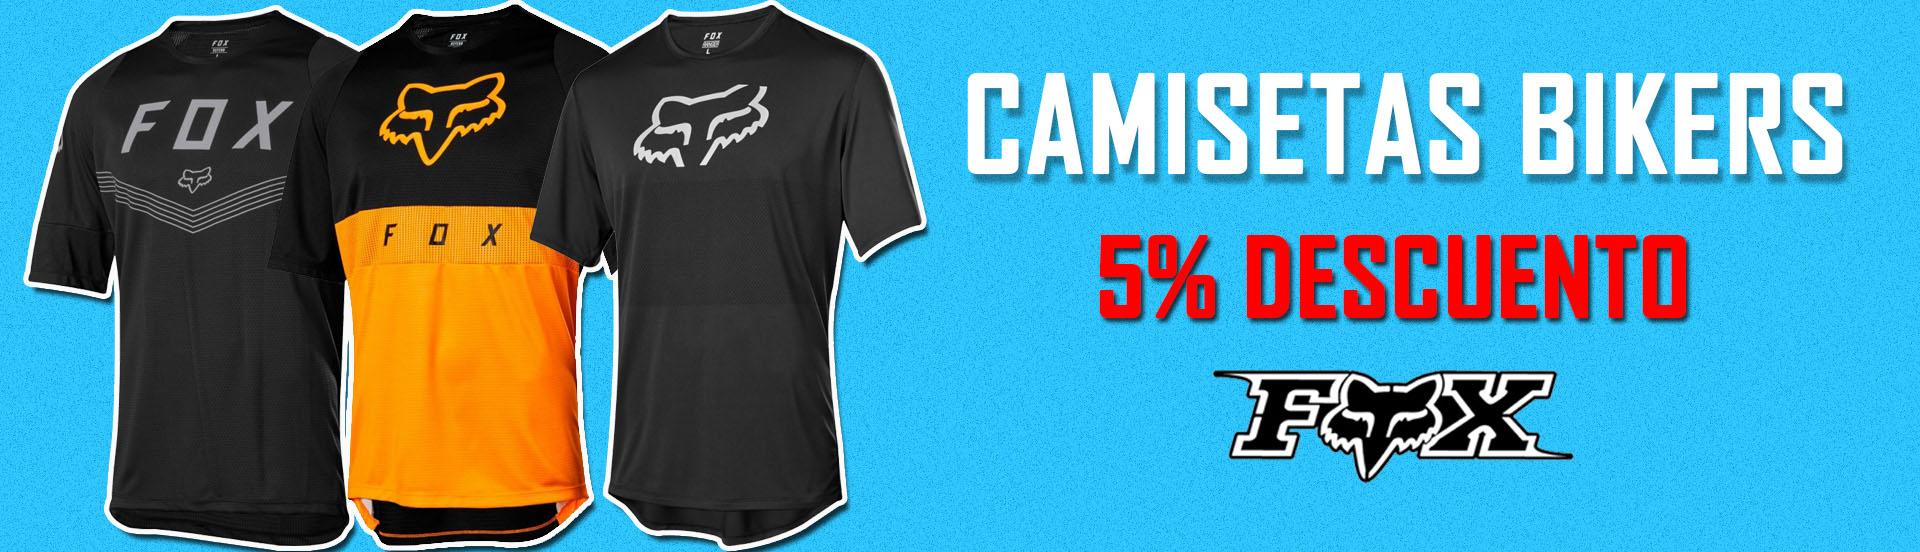 Camisetas Bikers